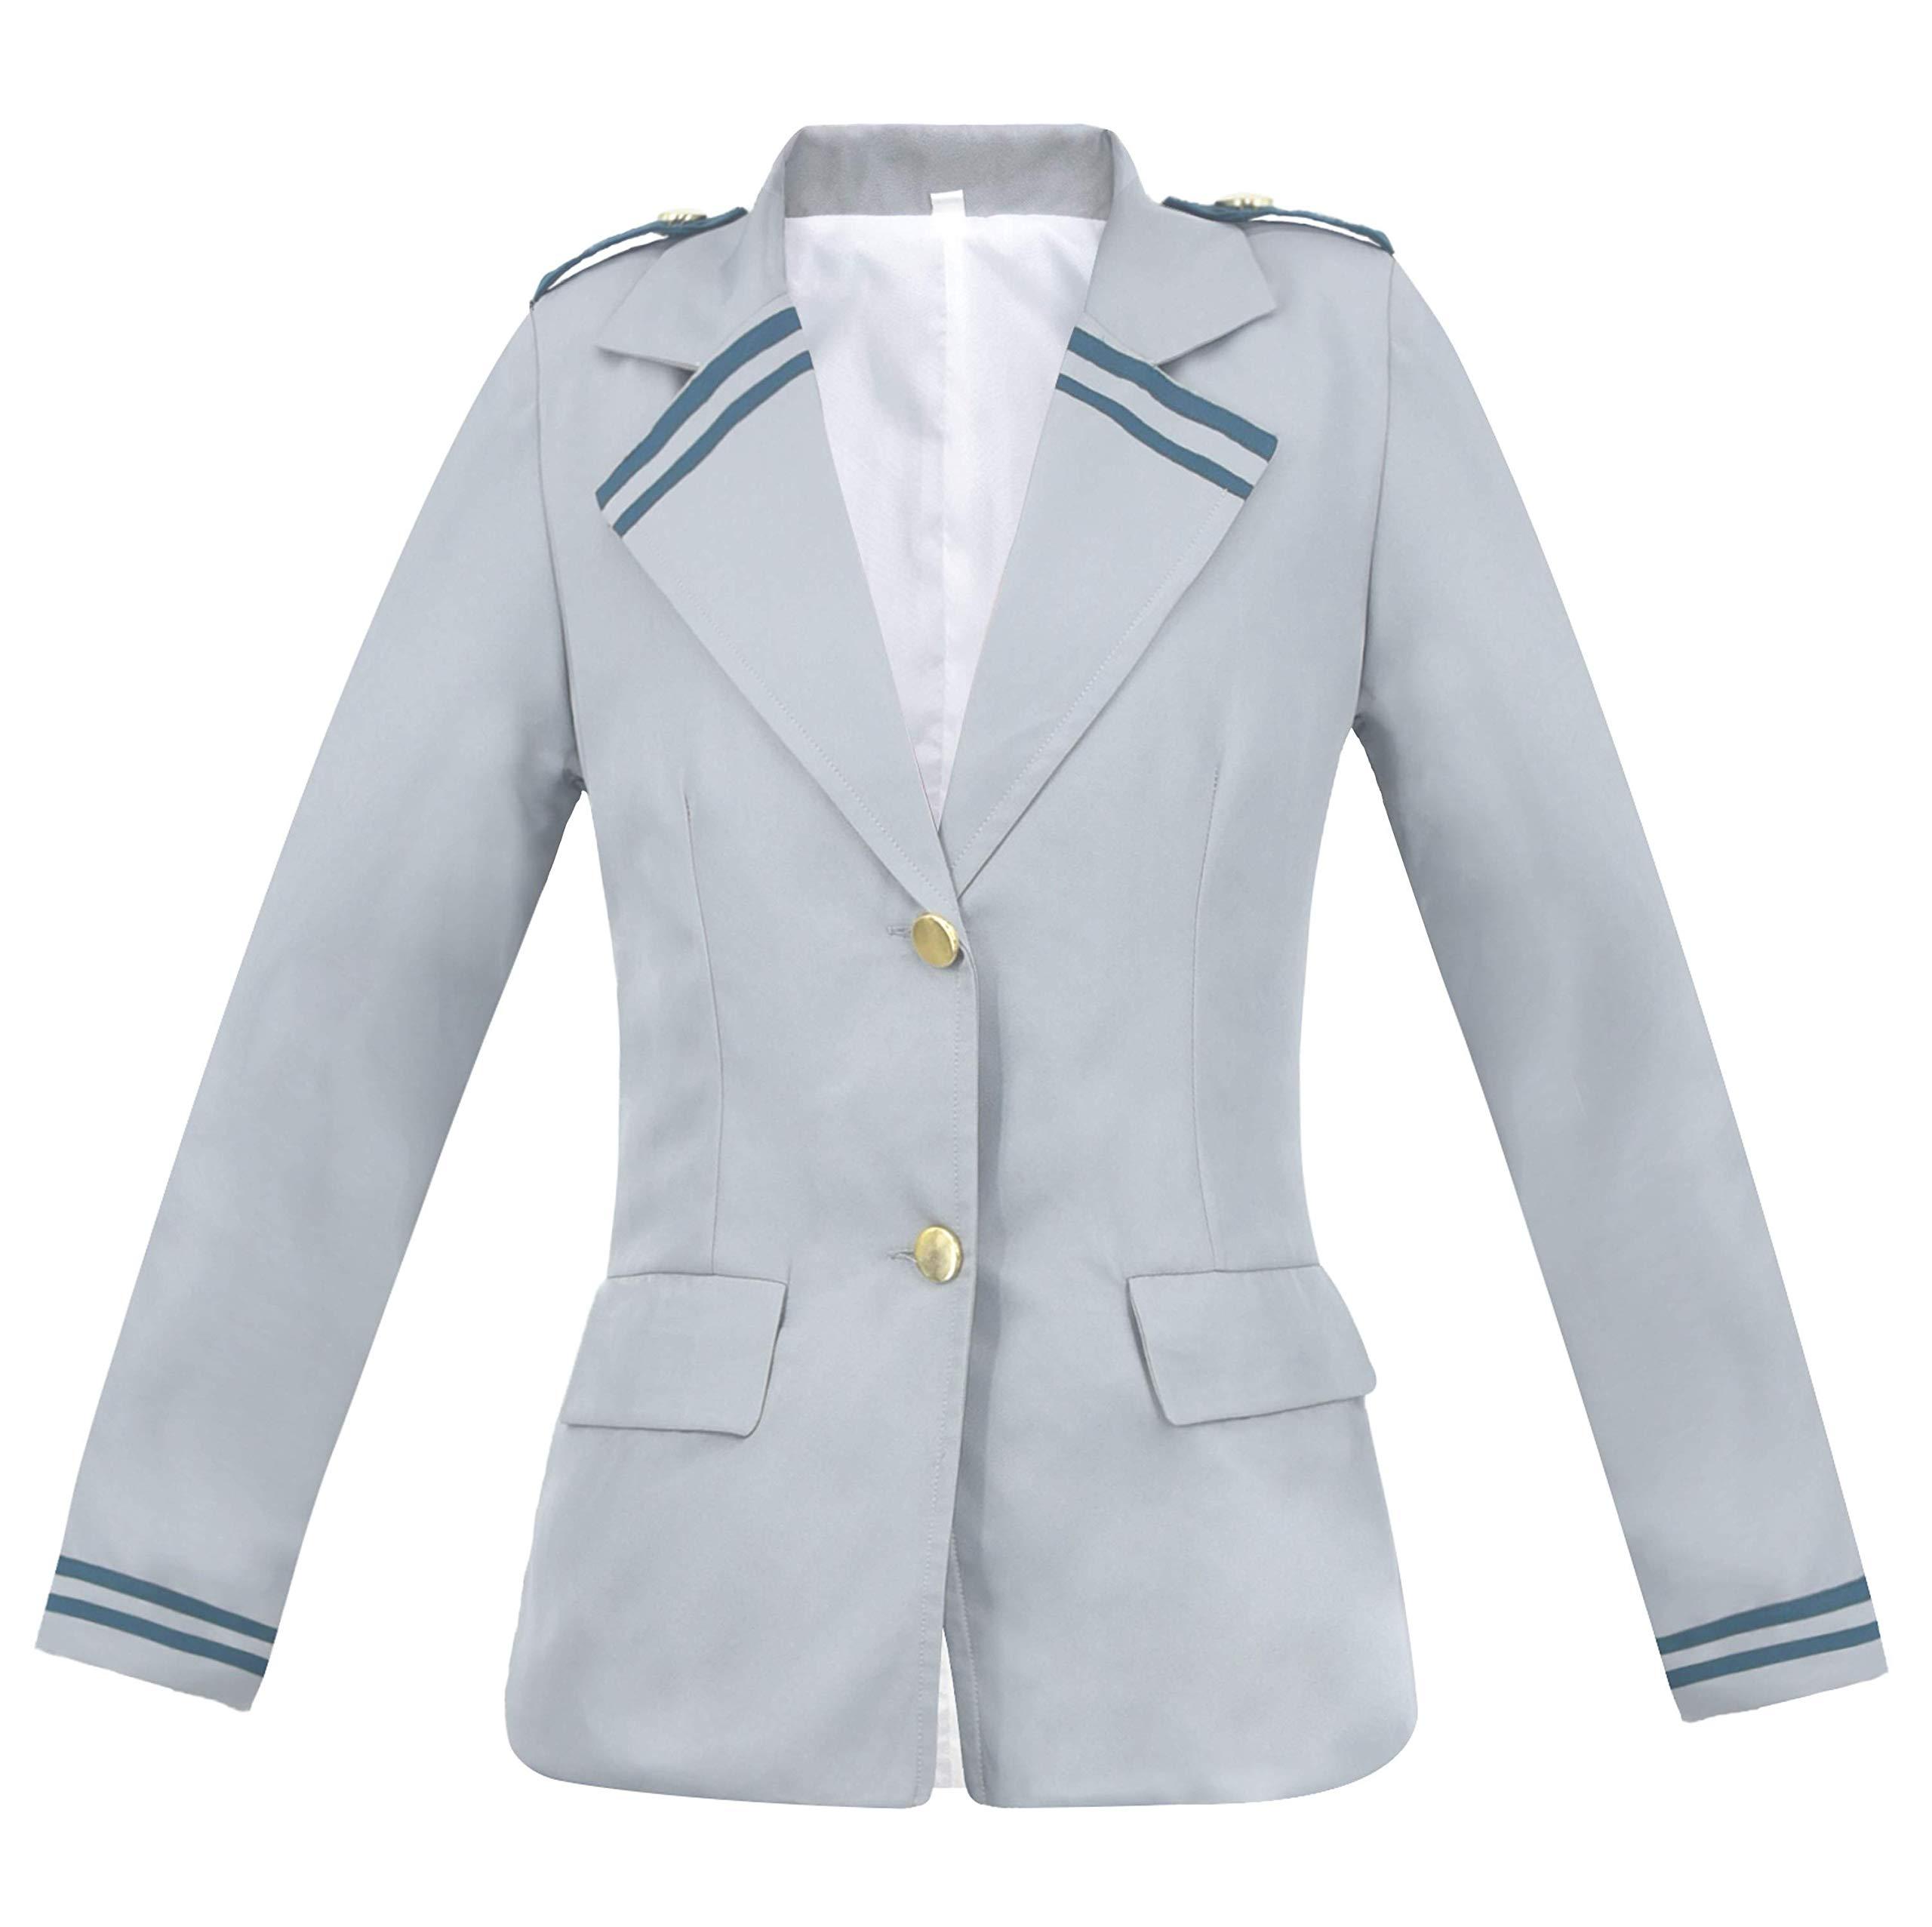 C-ZOFEK My Hero Academia Summer School Uniform Suit Shirt Dress Jacket Cosplay Costume -Adult Unisex US Size (Women Small)